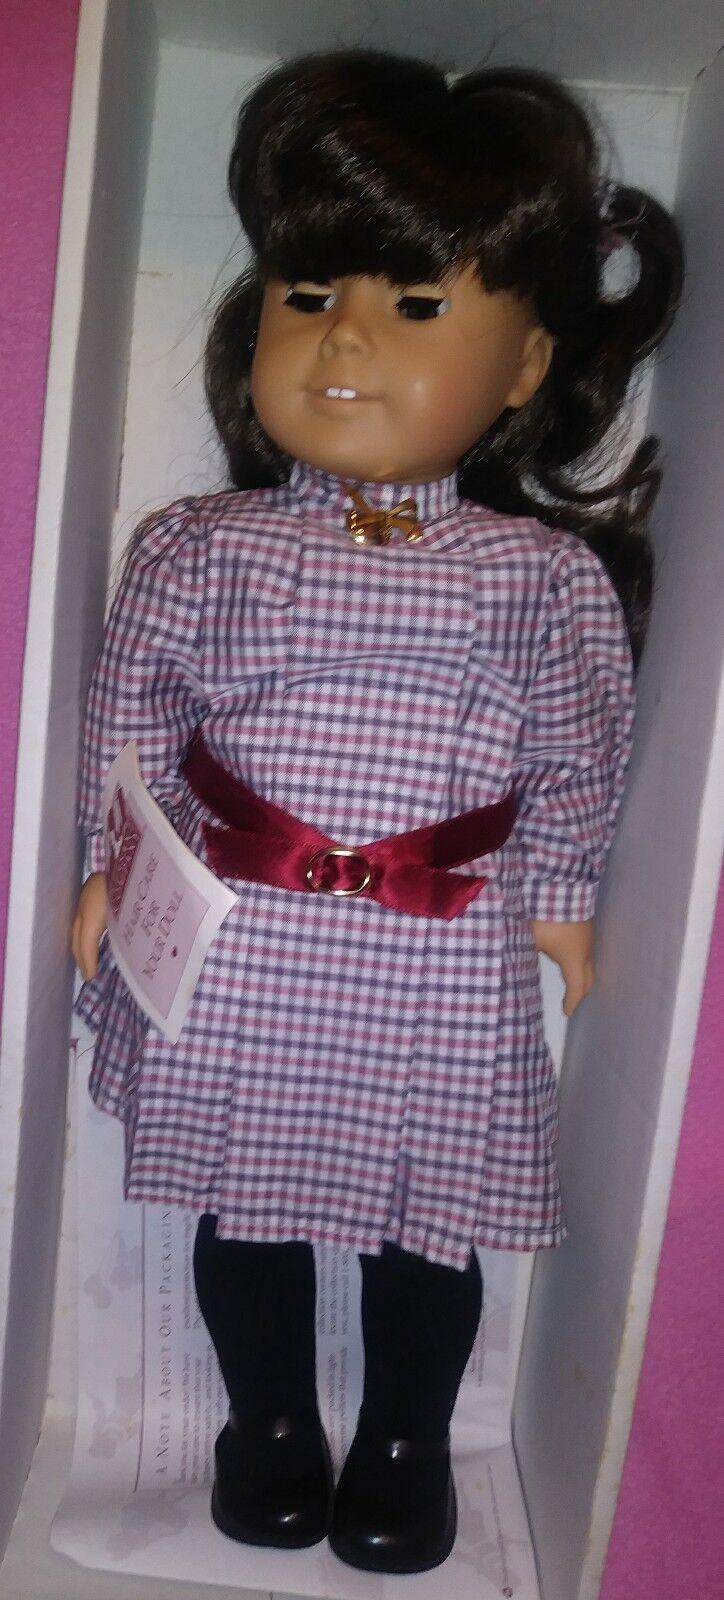 Pleasant Company American Girl 5.5m Bambola Samantha Parkington Vintage